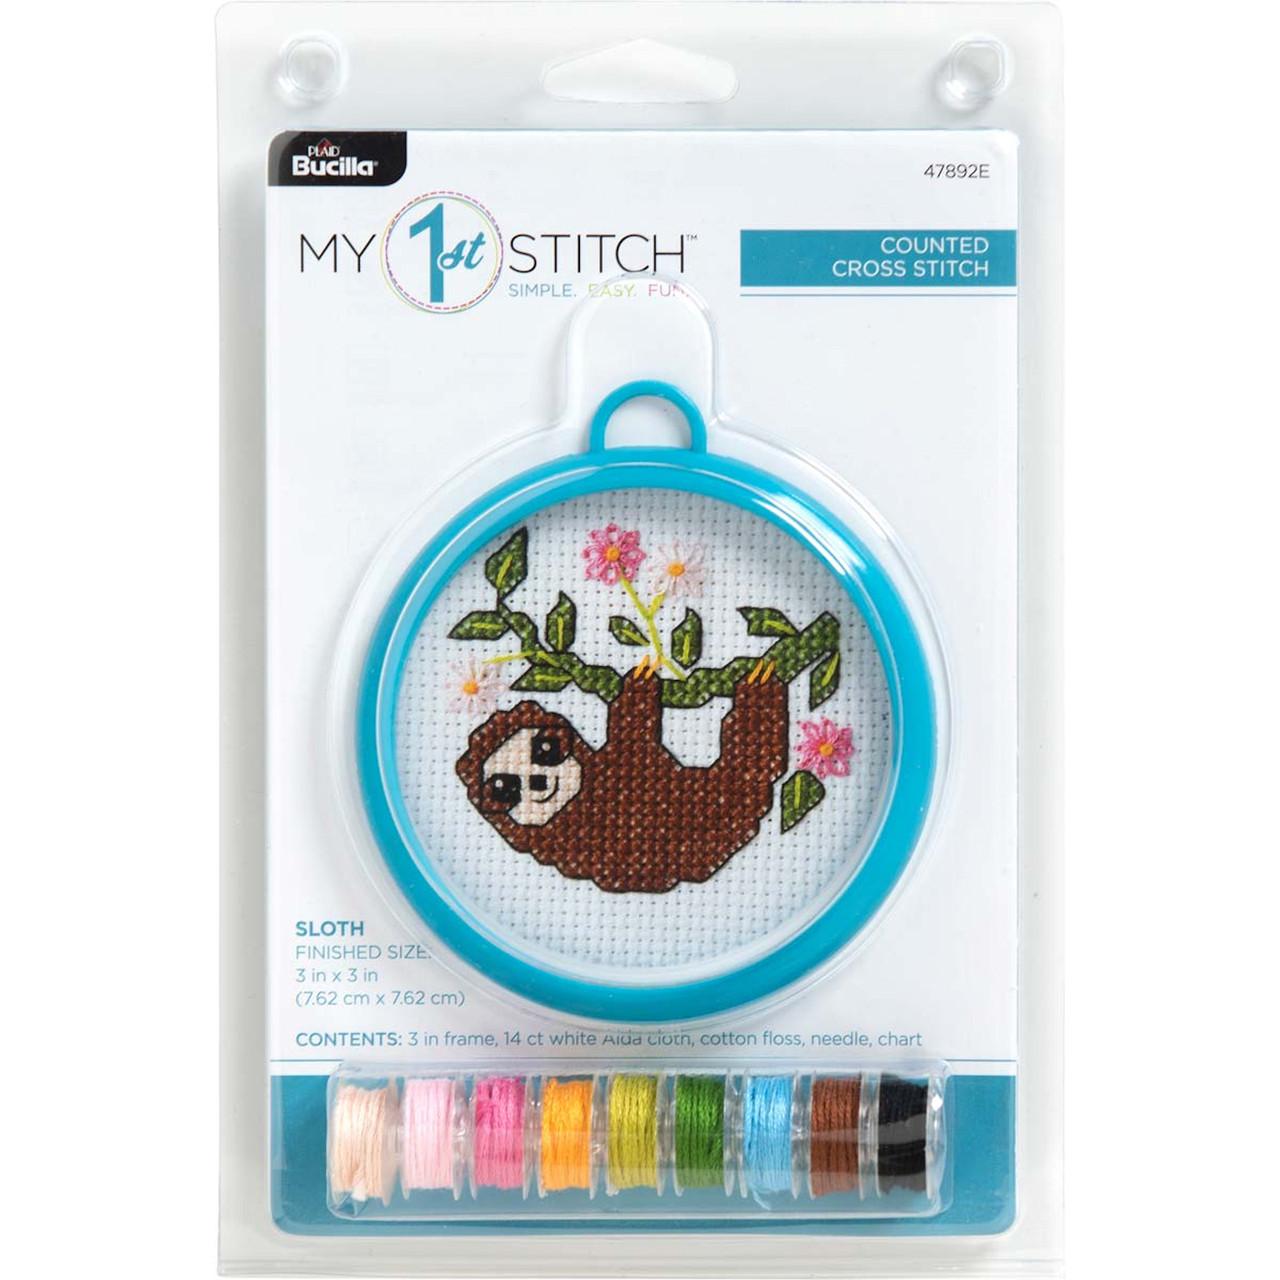 My 1st Stitch - Sloth